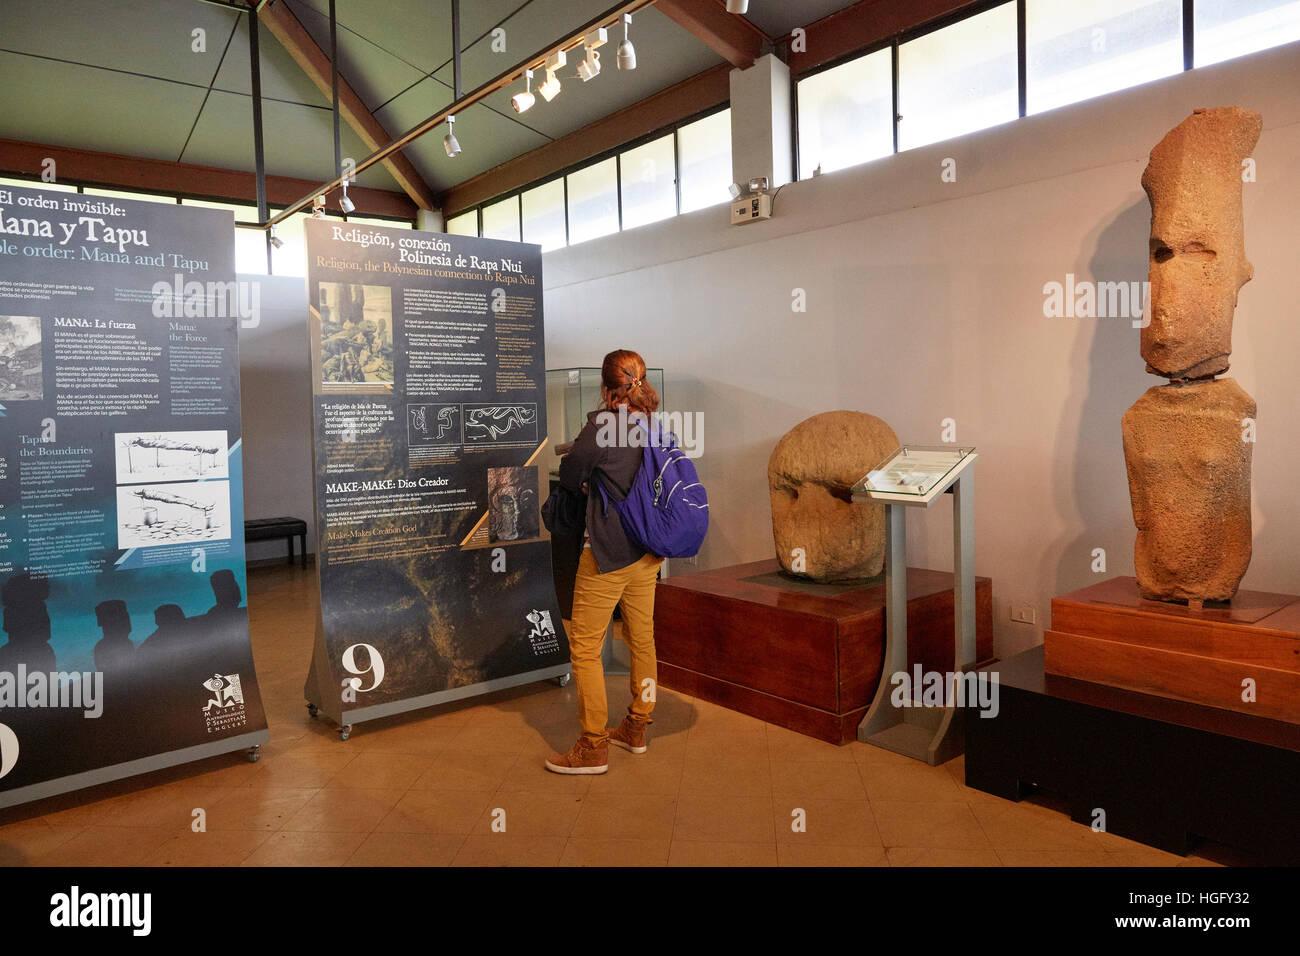 Inside Anthropological museum, Museo Antropologico Padre Sebastian Englert, Easter Island - Stock Image